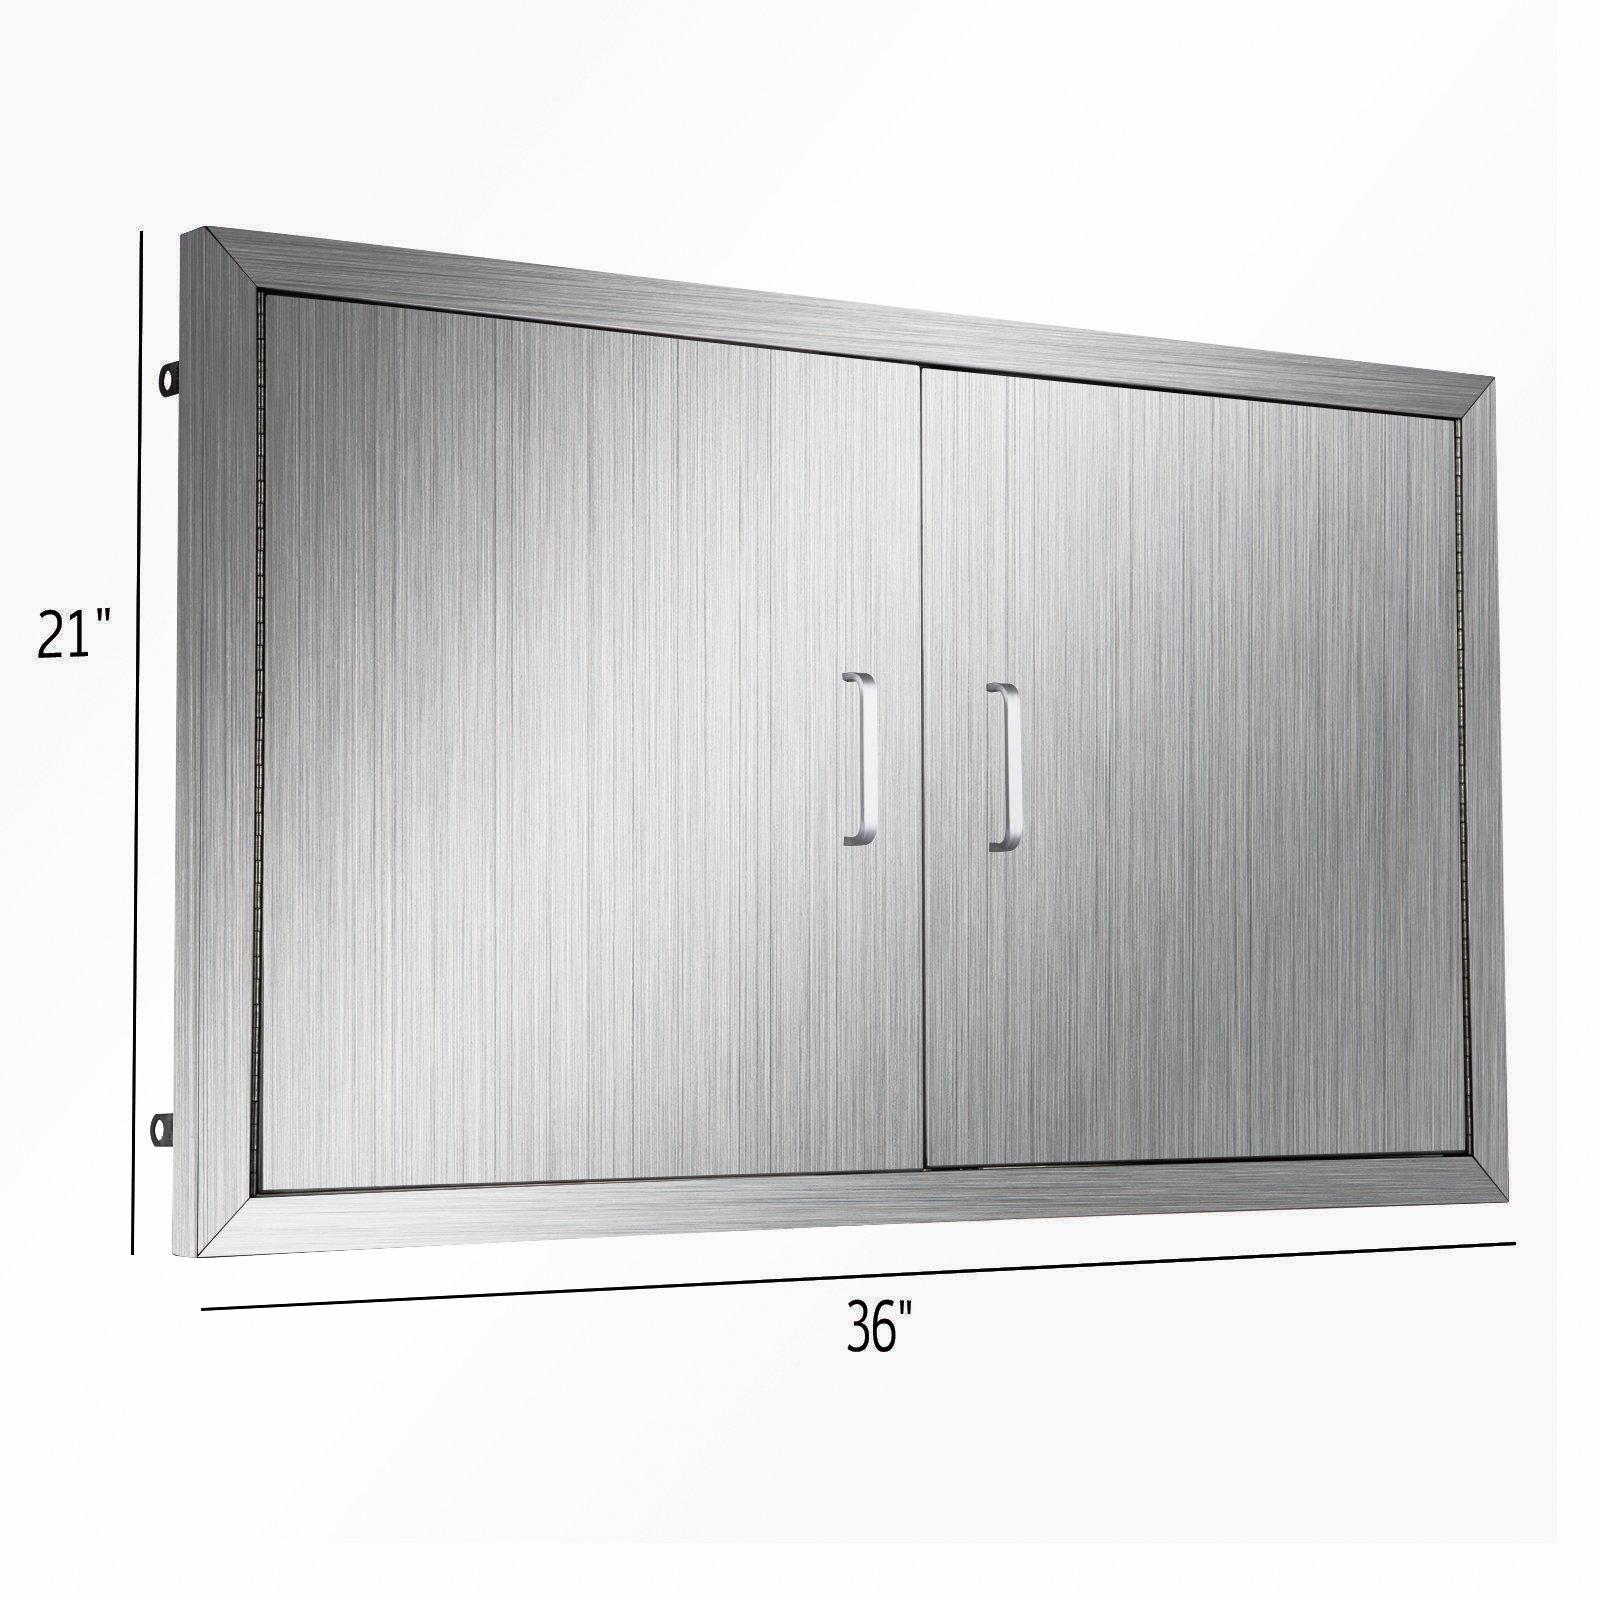 Happybuy BBQ island Door 36 Inch Flush Mount BBQ Access Door Commercial 304 Brushed Stainless Steel for Outdoor Kitchen